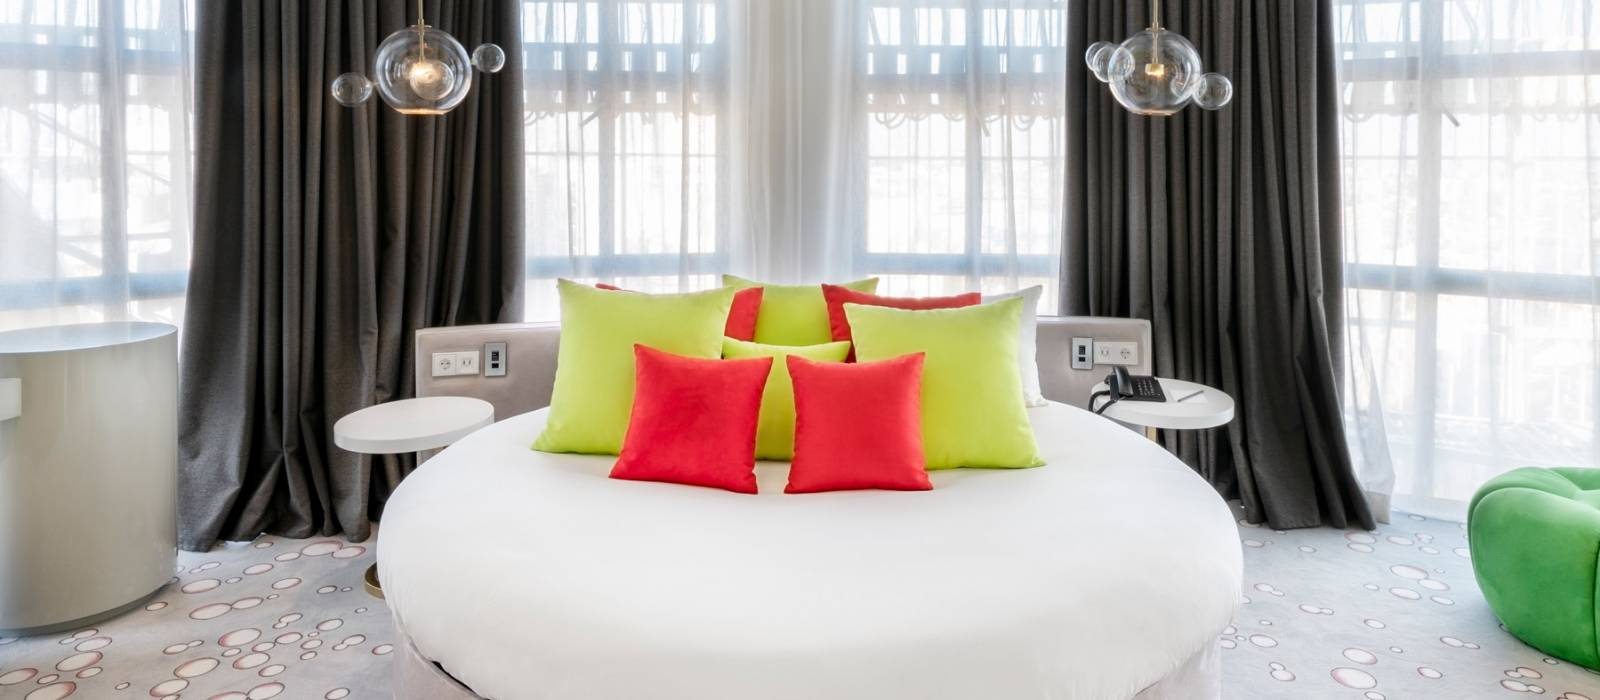 Chambres Capitol Hôtel Madrid - Vincci Hoteles - Vincci Sky-light